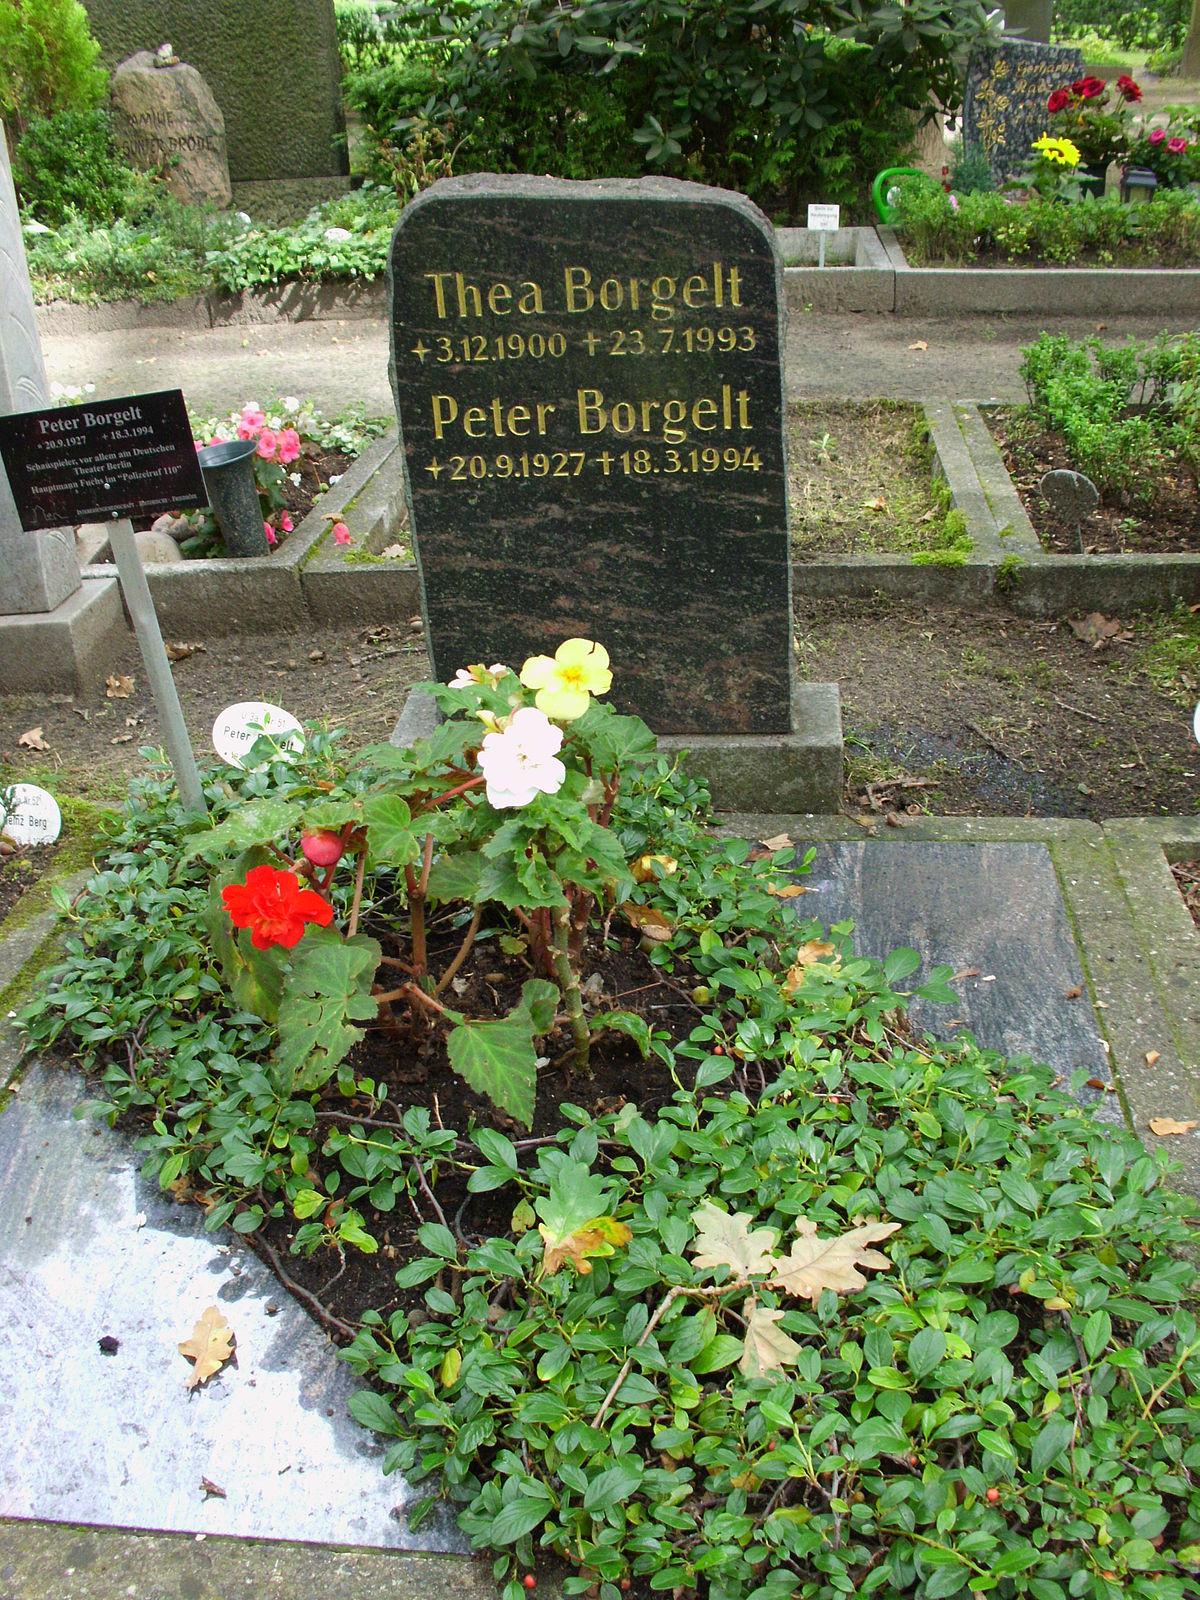 Peter Borgelt Wikipedia